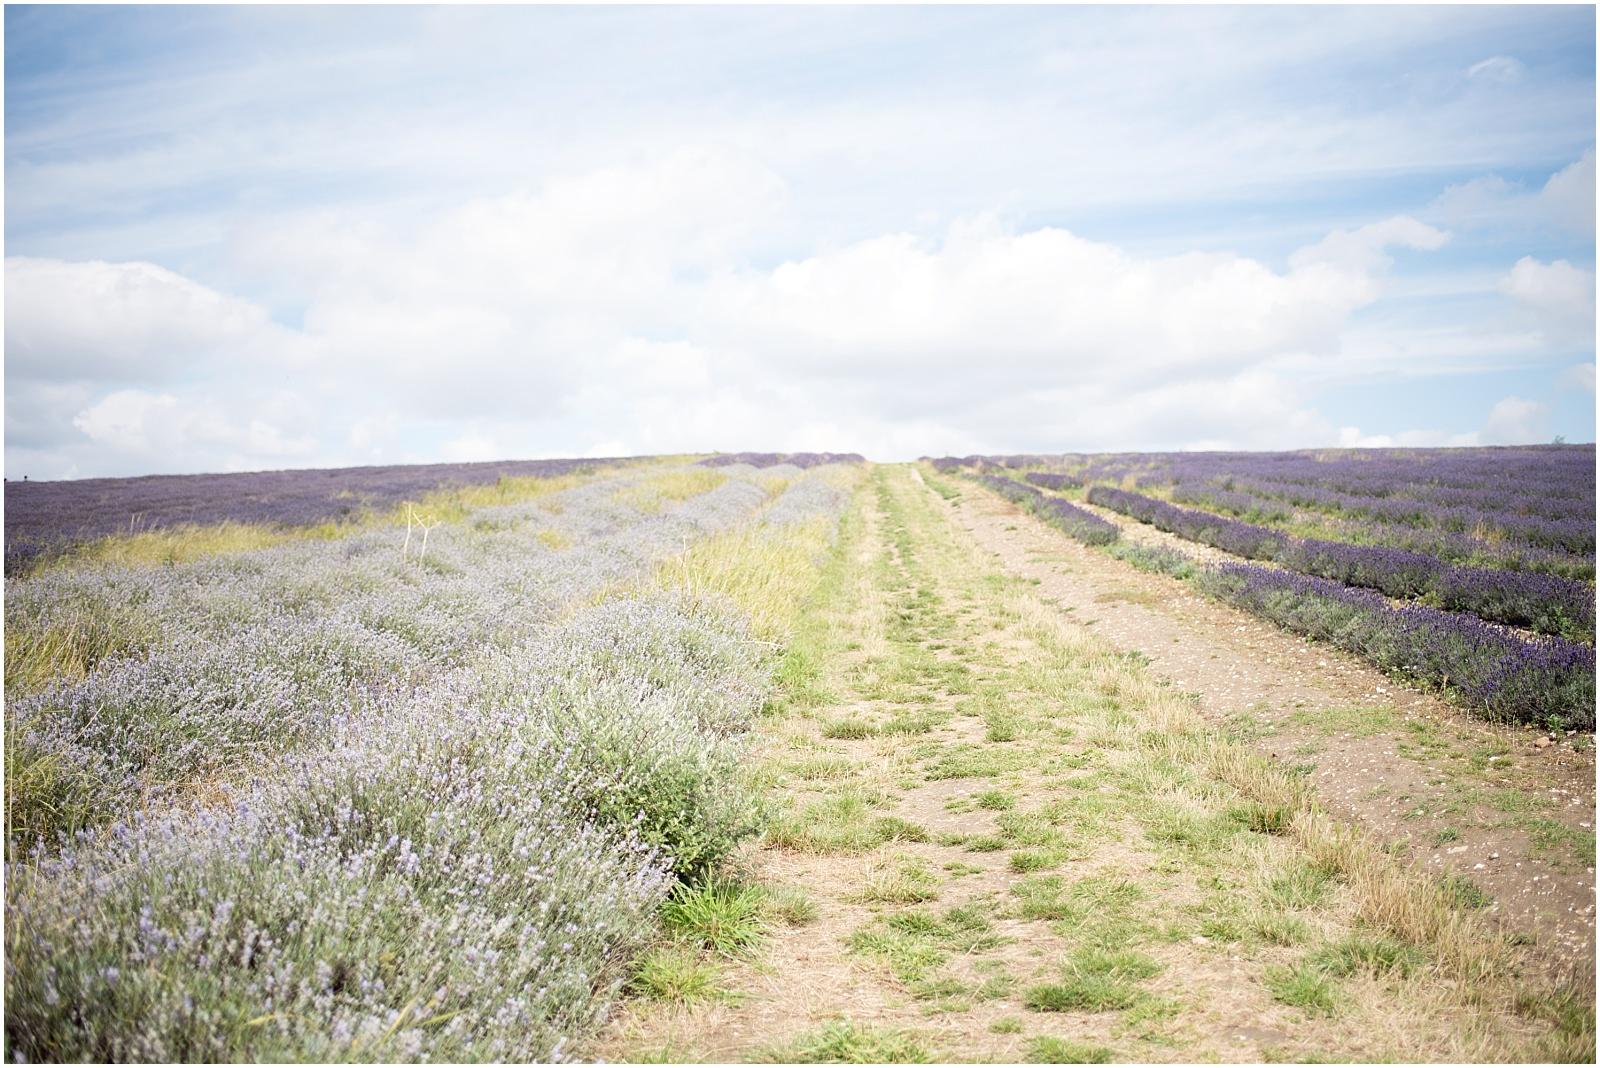 Hitchin lavender field